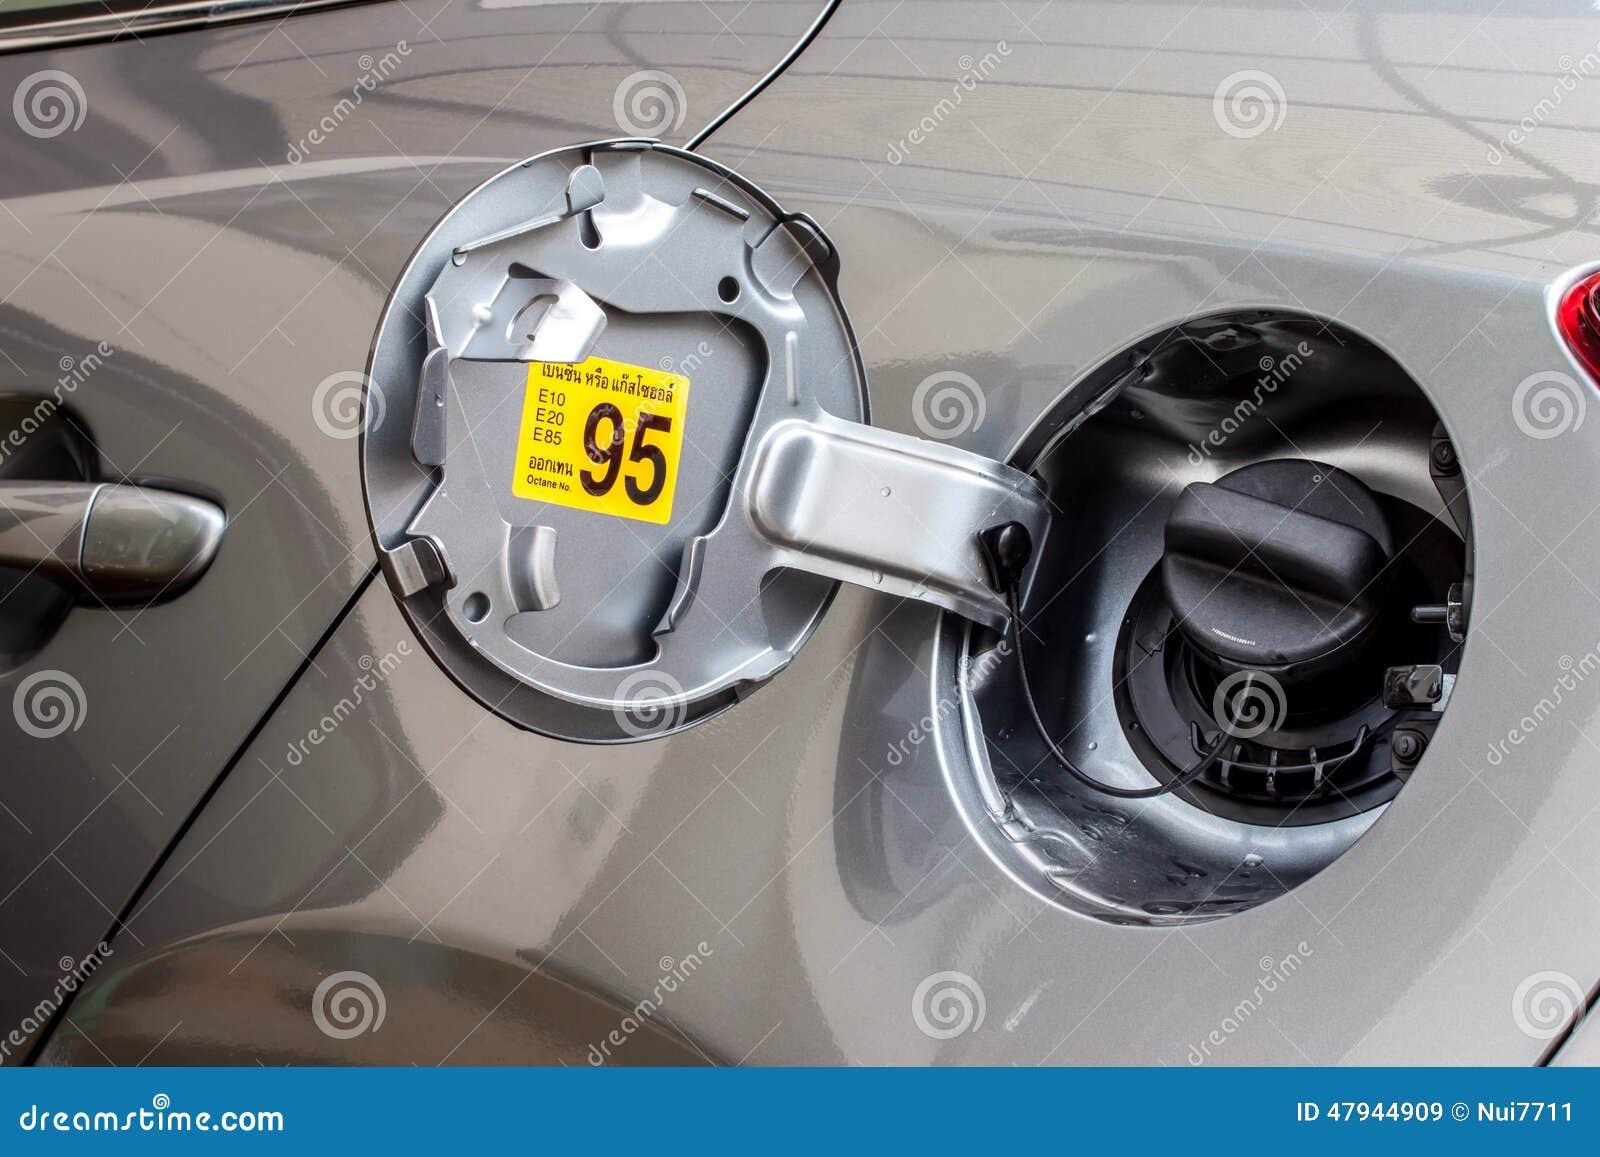 Automotive Gas Cap : Car fuel tank cap stock photo image